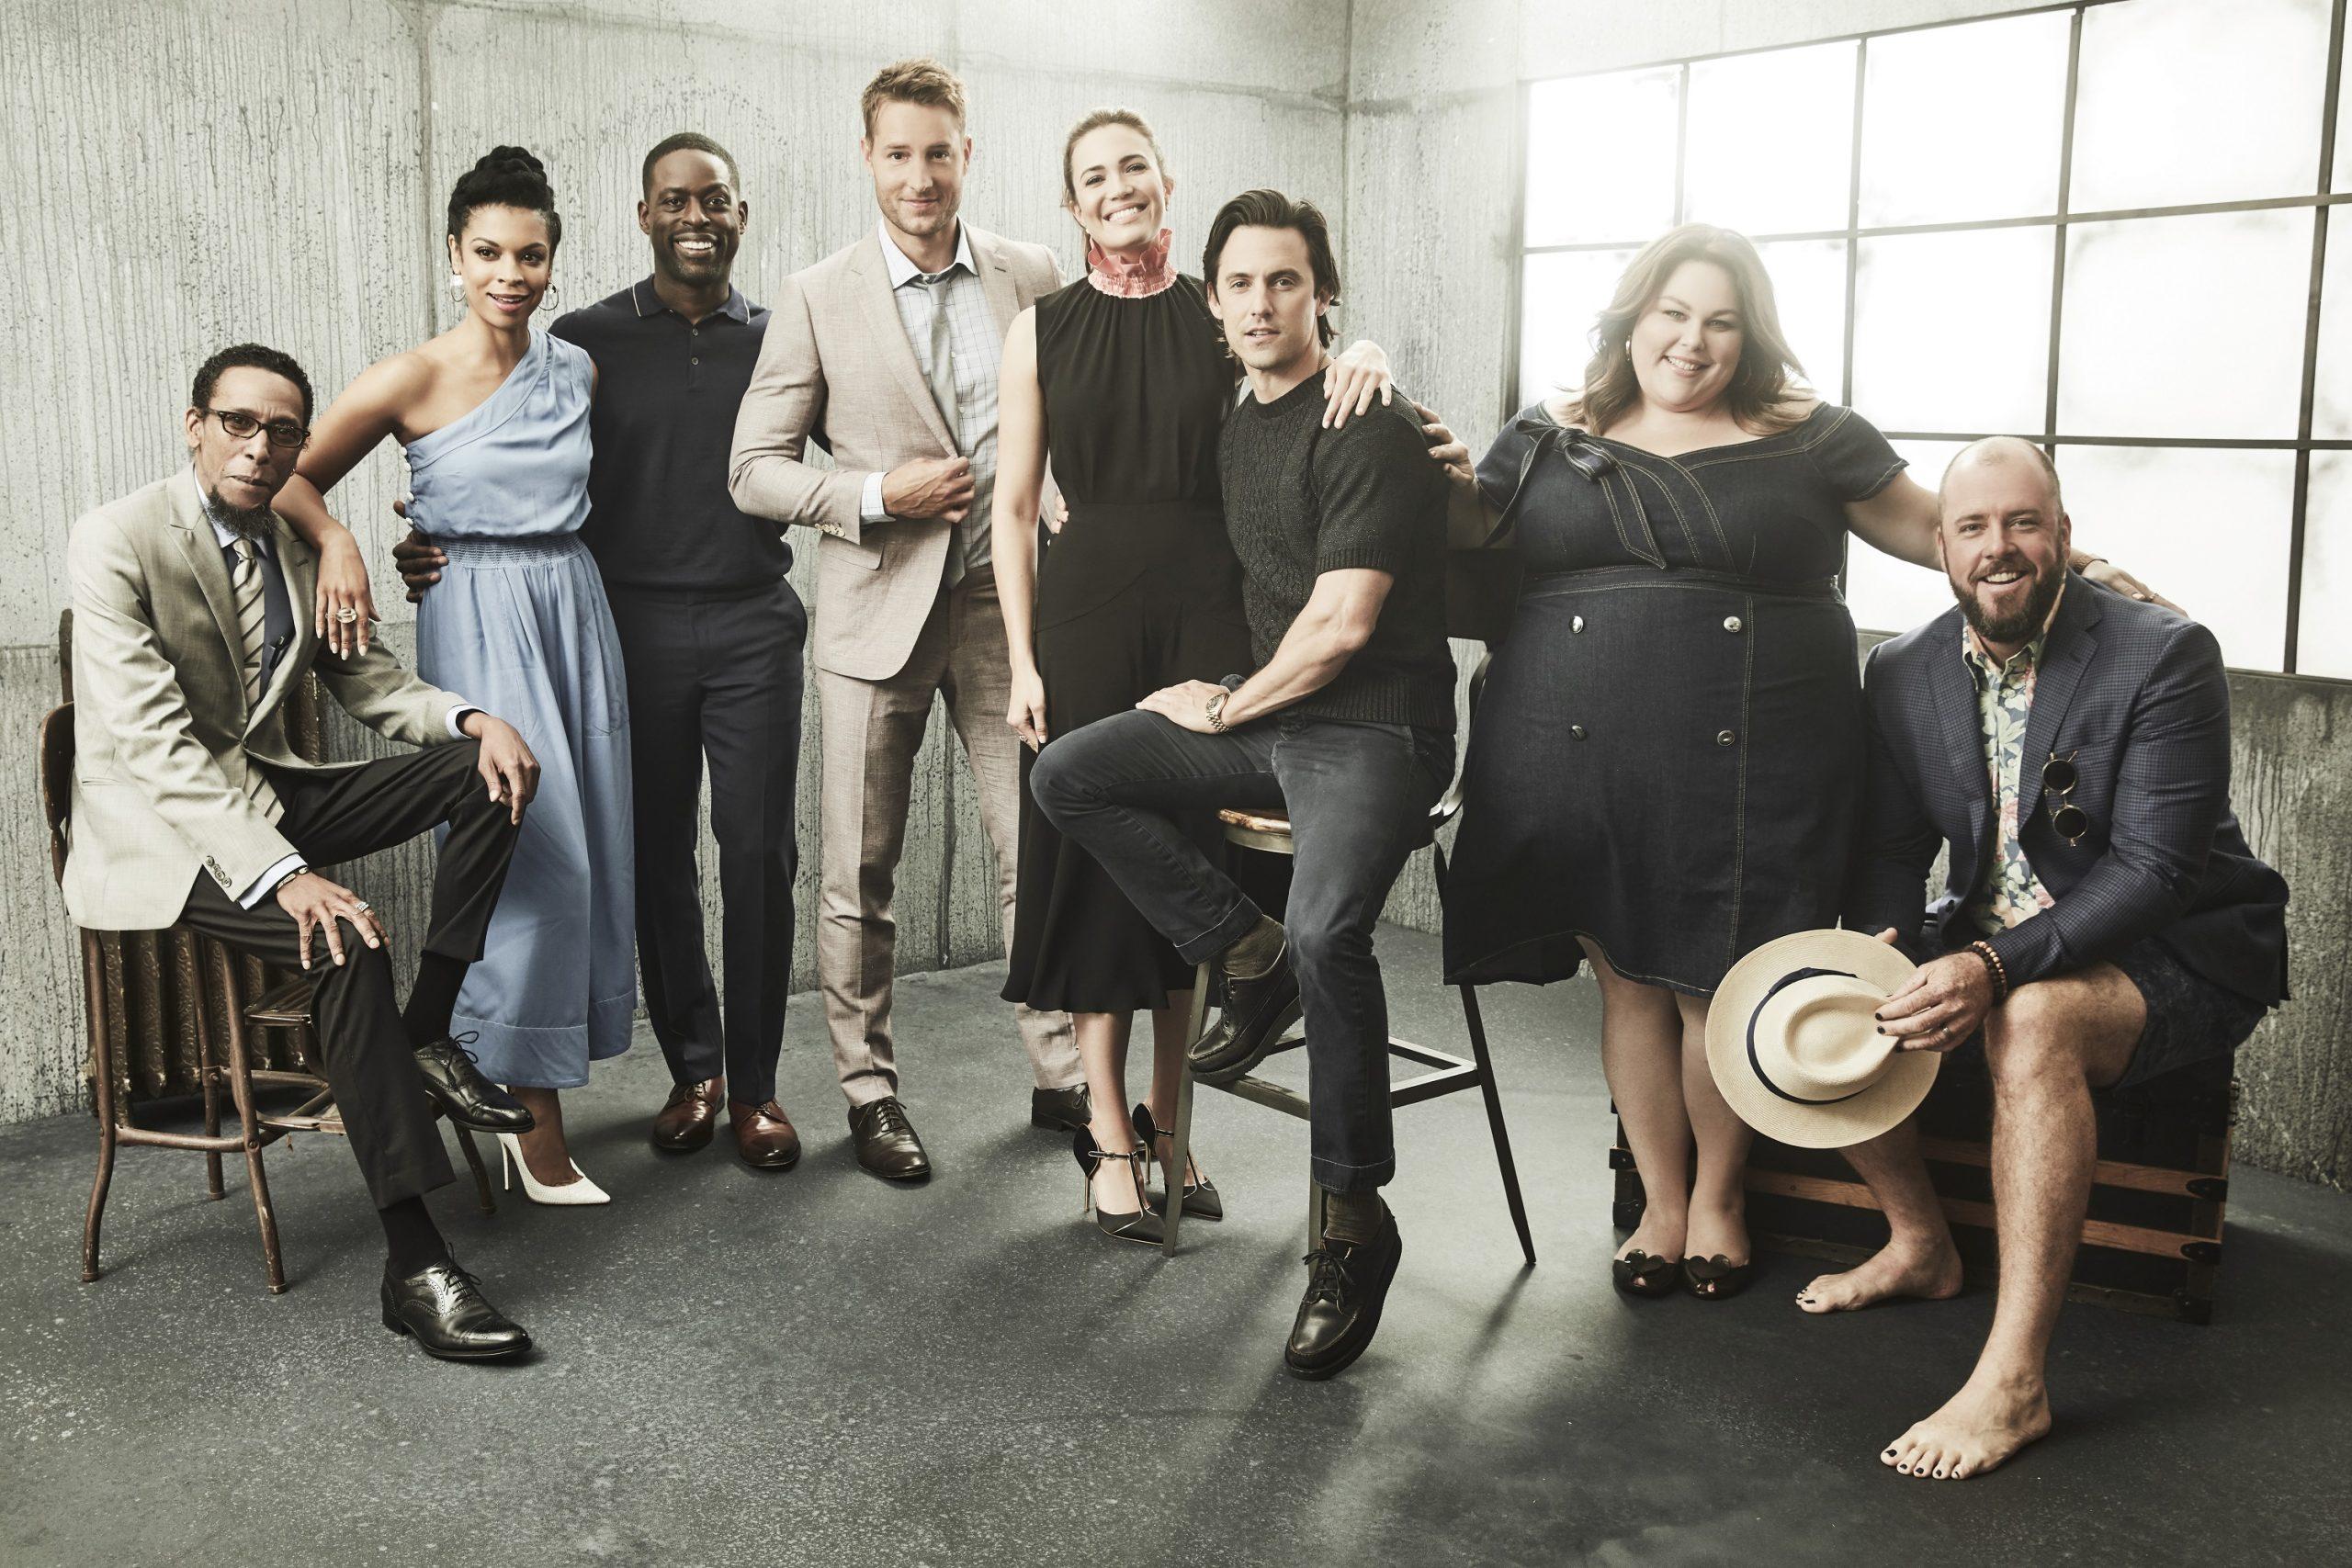 'This Is Us' Cast: Ron Cephas Jones, Susan Kelechi Watson, Sterling K. Brown, Chrissy Metz, Mandy Moore, Milo Ventimiglia, Justin Hartley, and Chris Sullivan